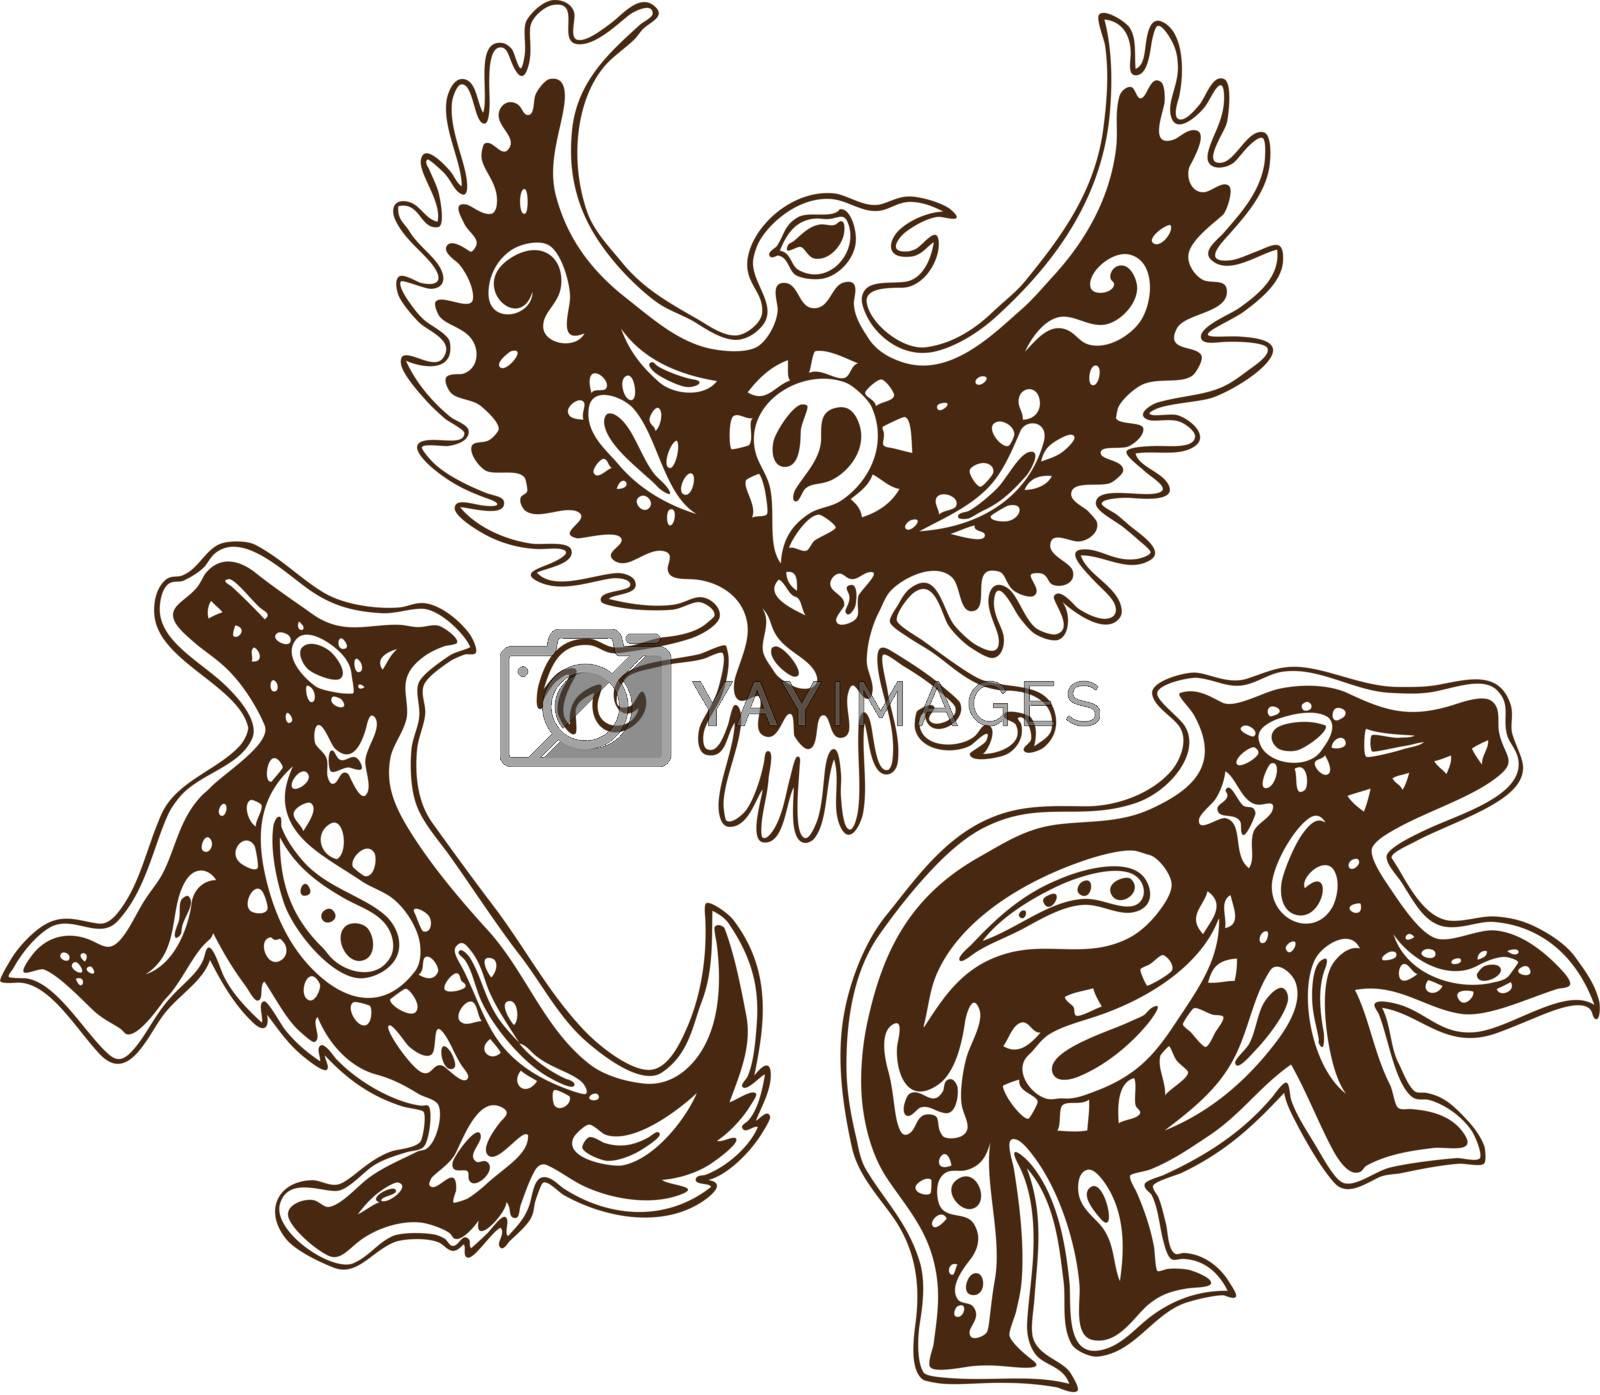 Set of 3 hand drawn tribal animals.